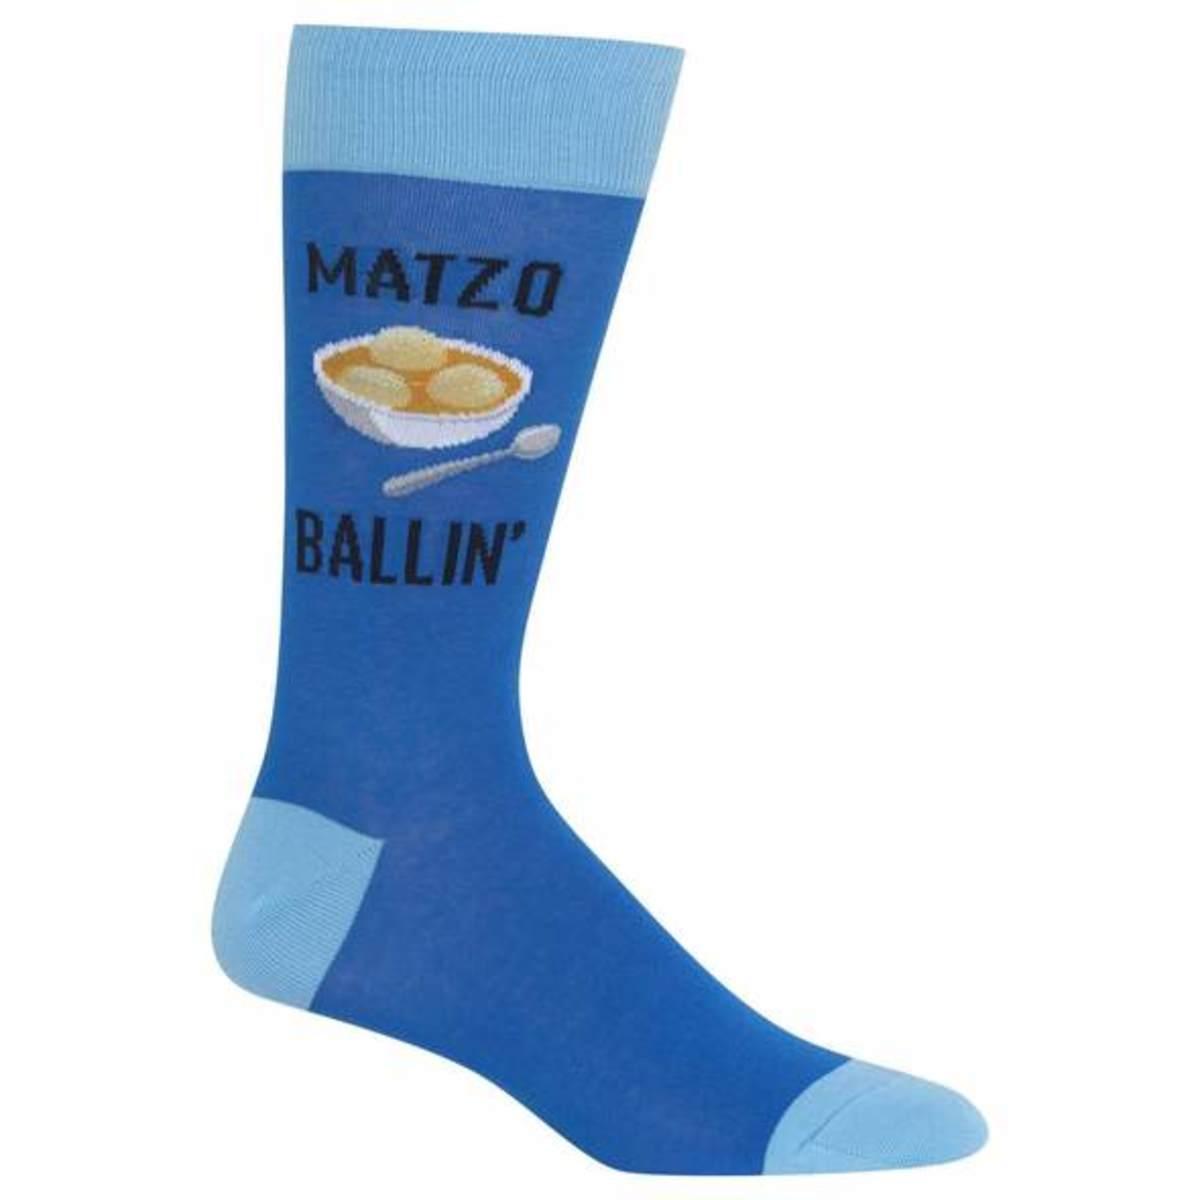 Hot_Sox_Men_s_Matzo_Ballin__Crew_Socks_047852234139_590x